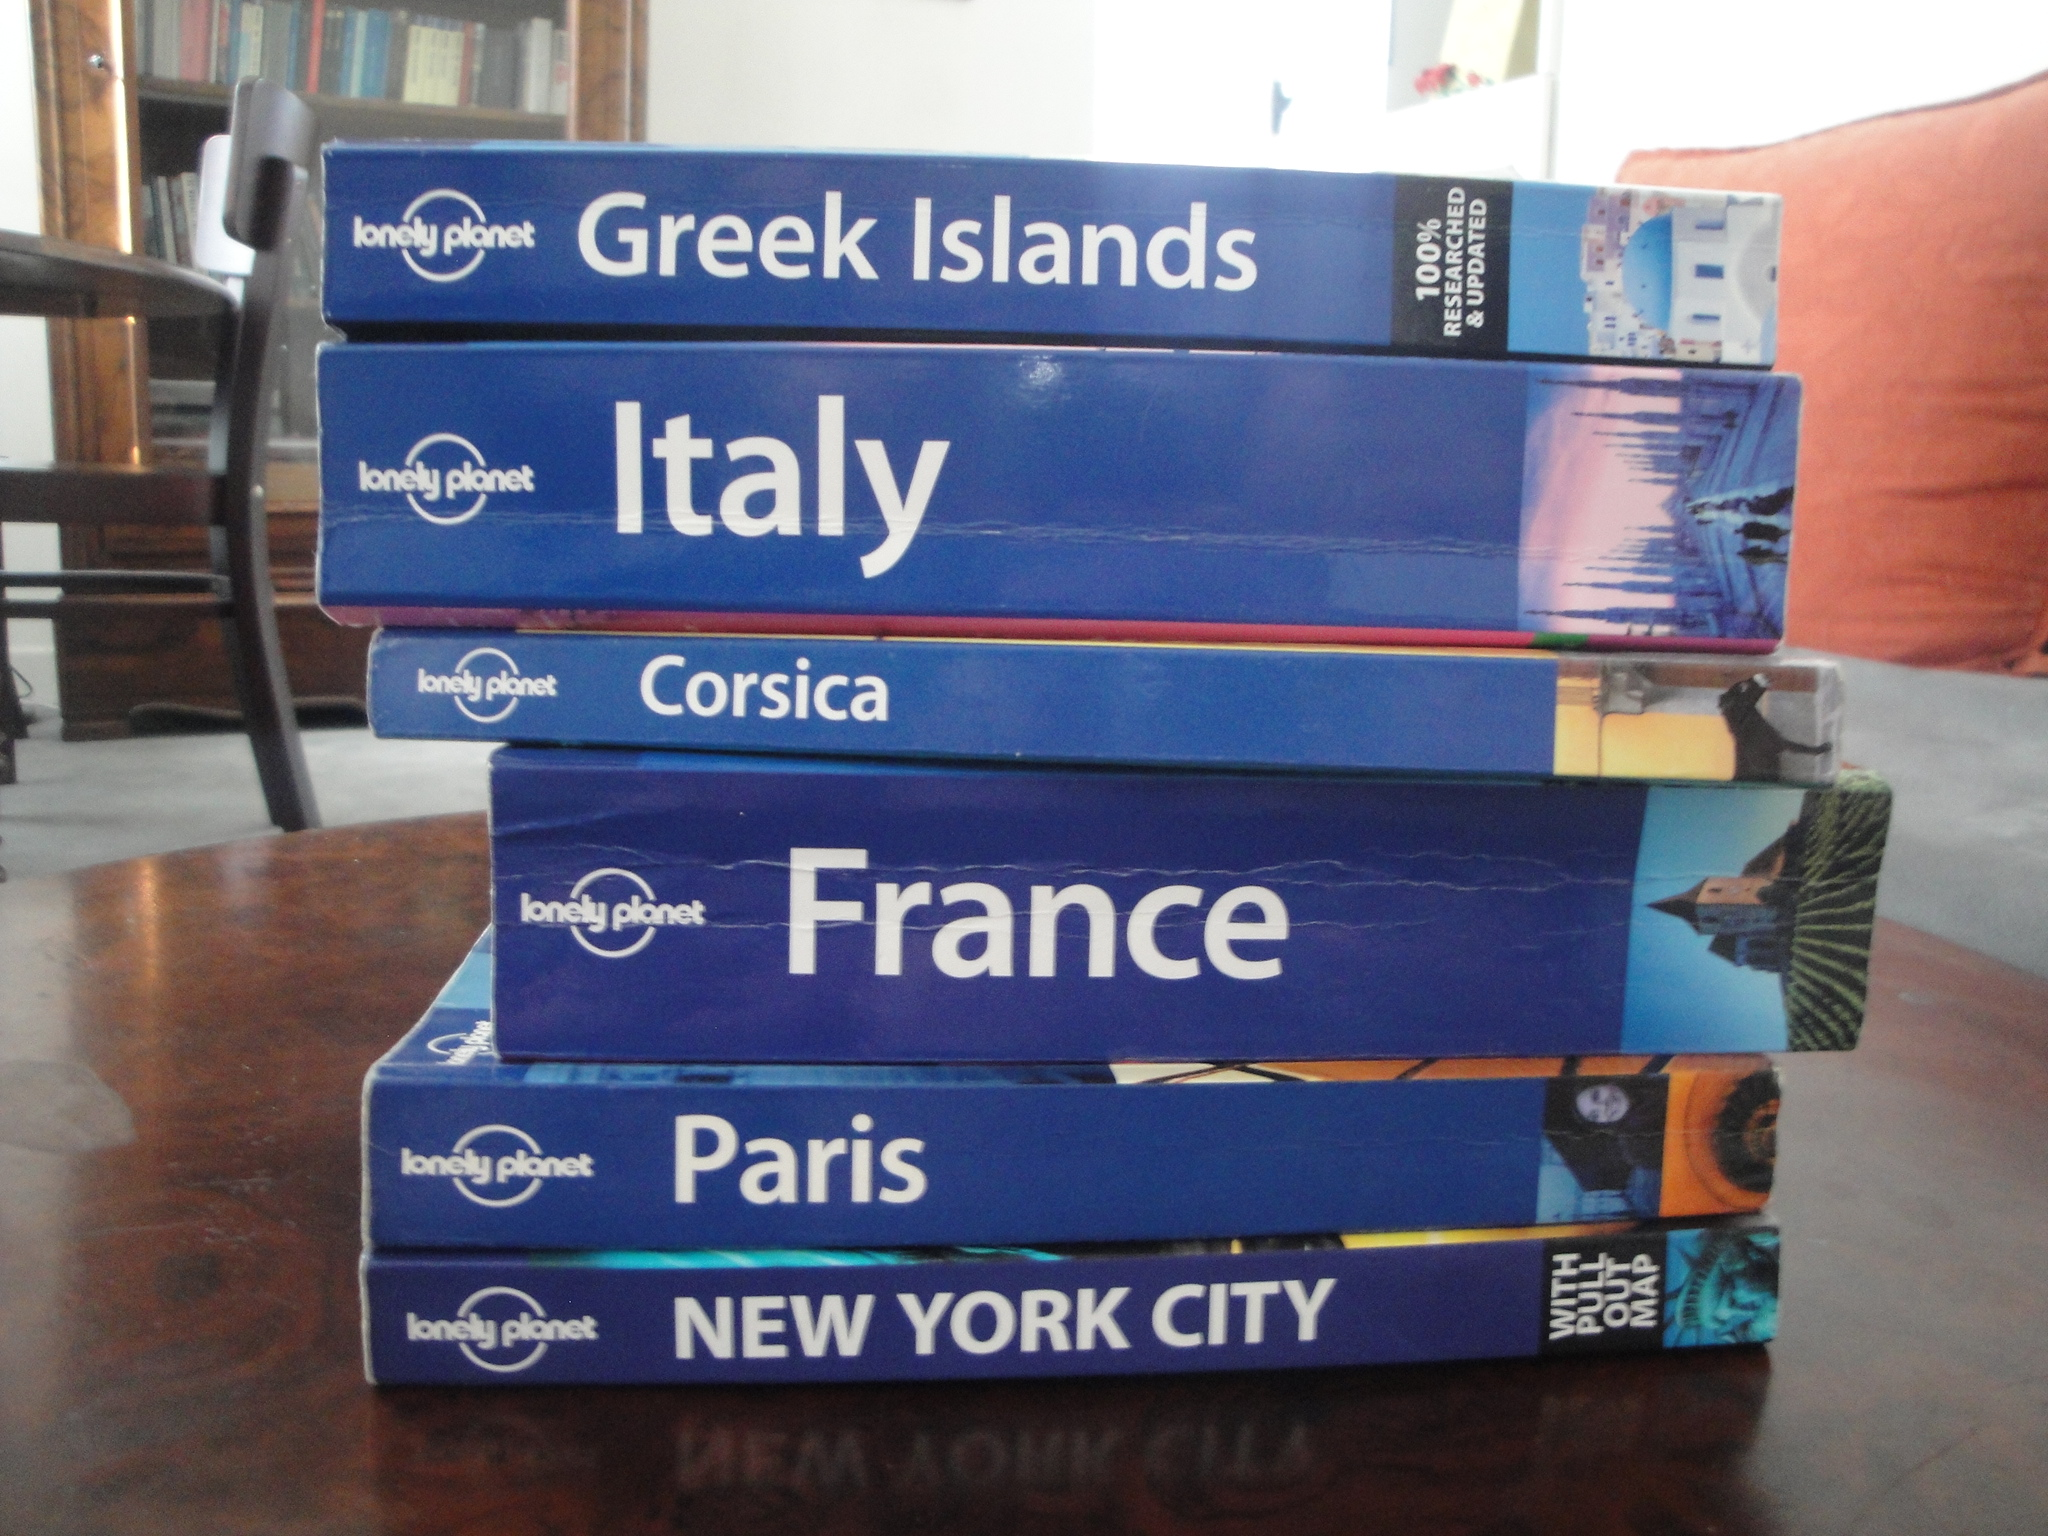 travel books love in the city of lights rh loveinthecityoflights com european travel guide books best travel guide books 2018 europe